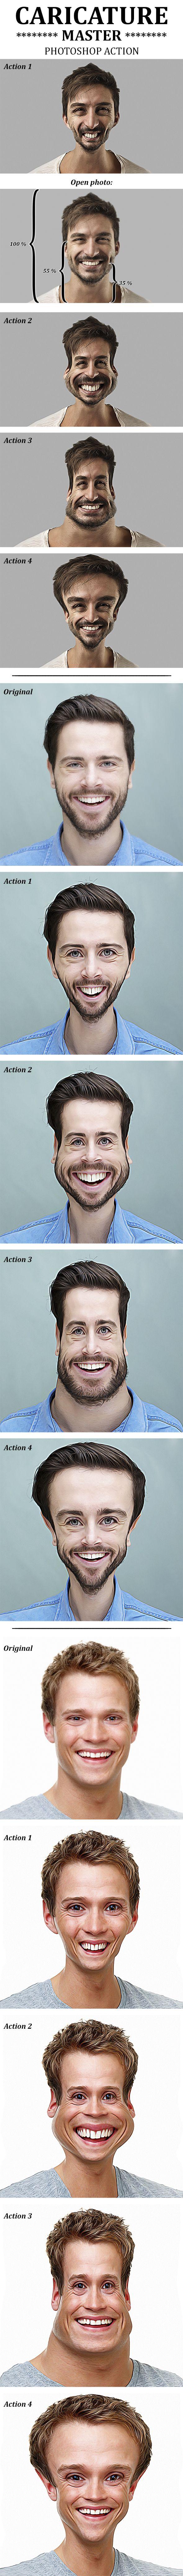 Caricature Master Photoshop Action - Actions Photoshop